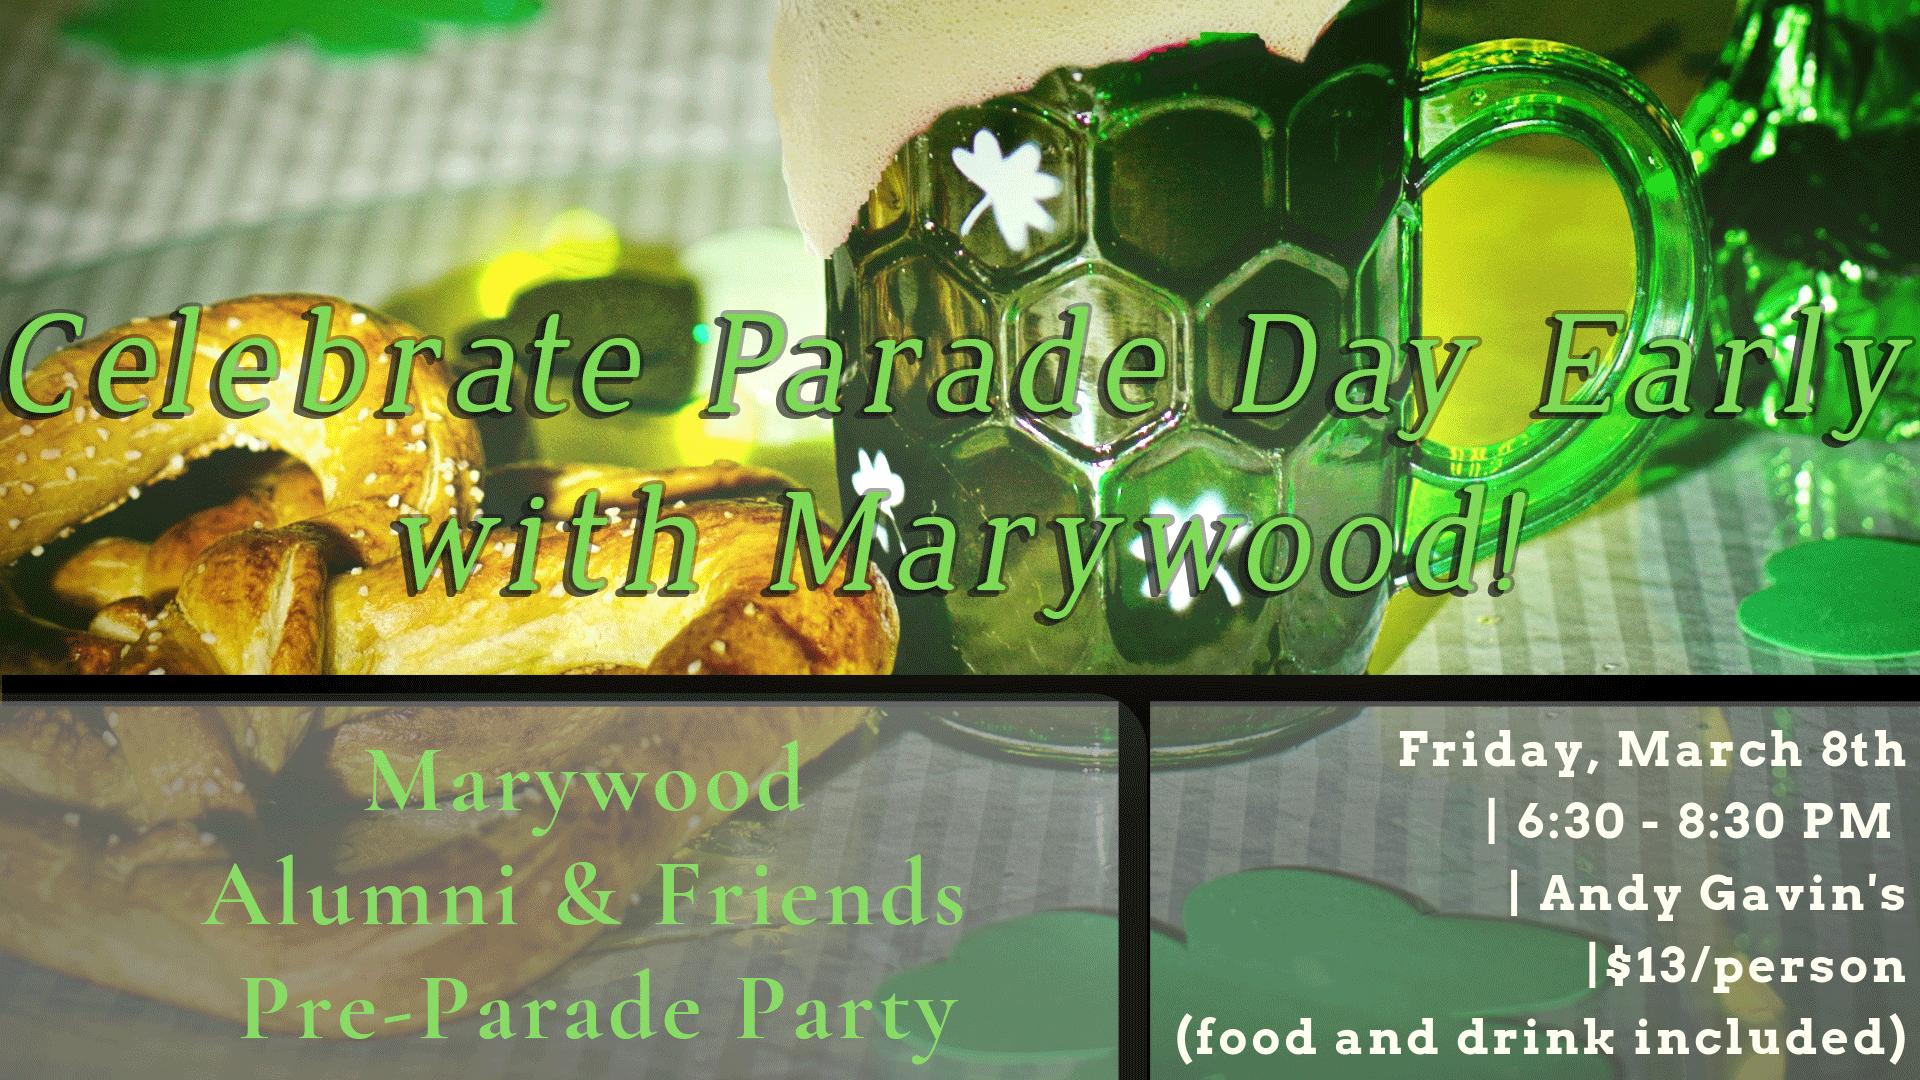 Marywood Alumni & Friends Pre-Parade Party - March 8th, 6:30-8:30 p.m.